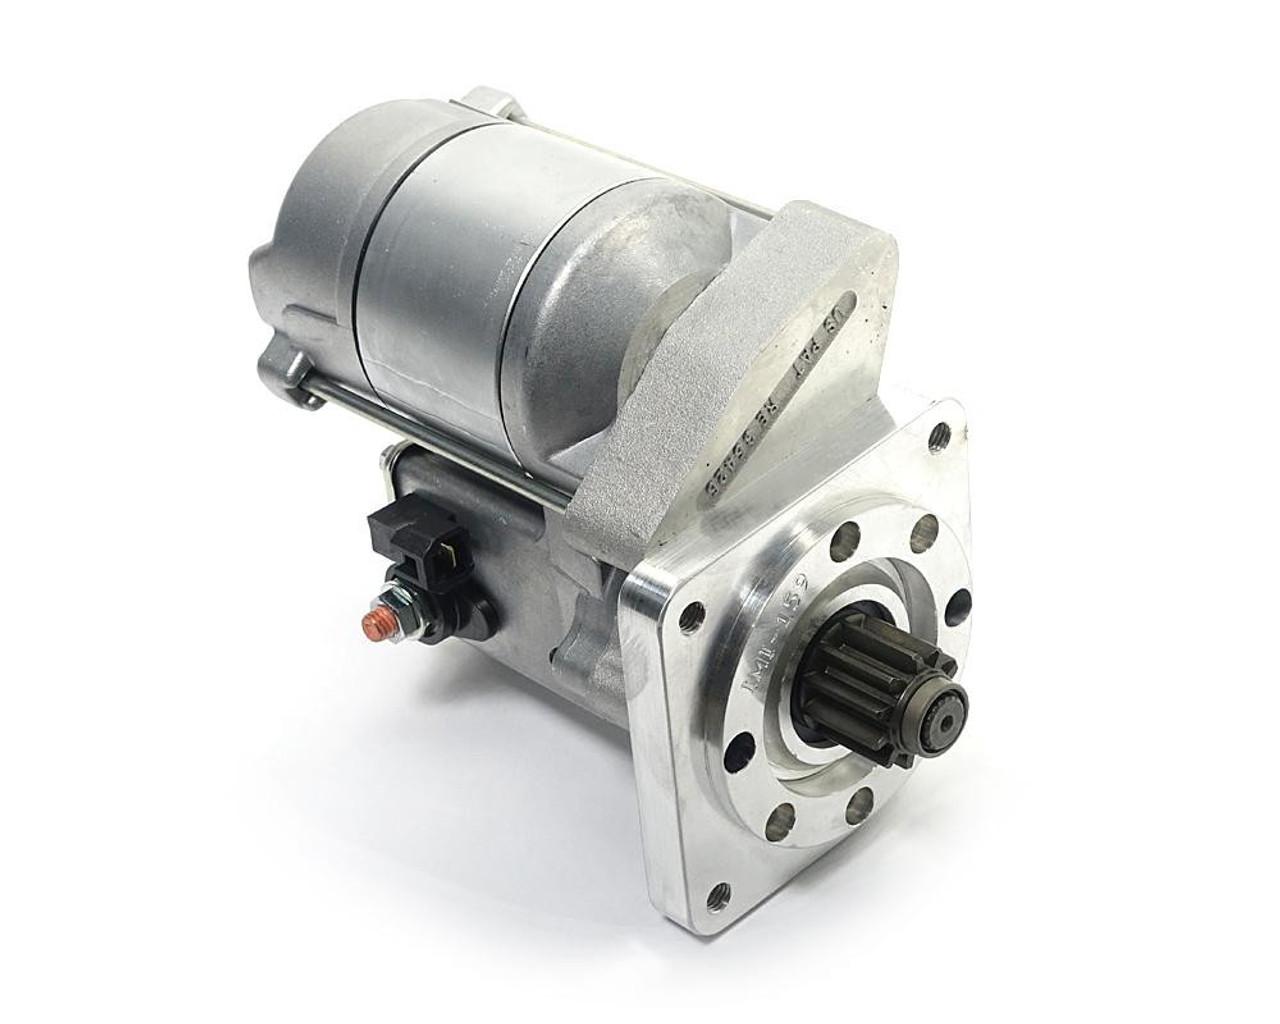 Starter - Fiat 124 1966-1985 - High Performance Gear Reduction